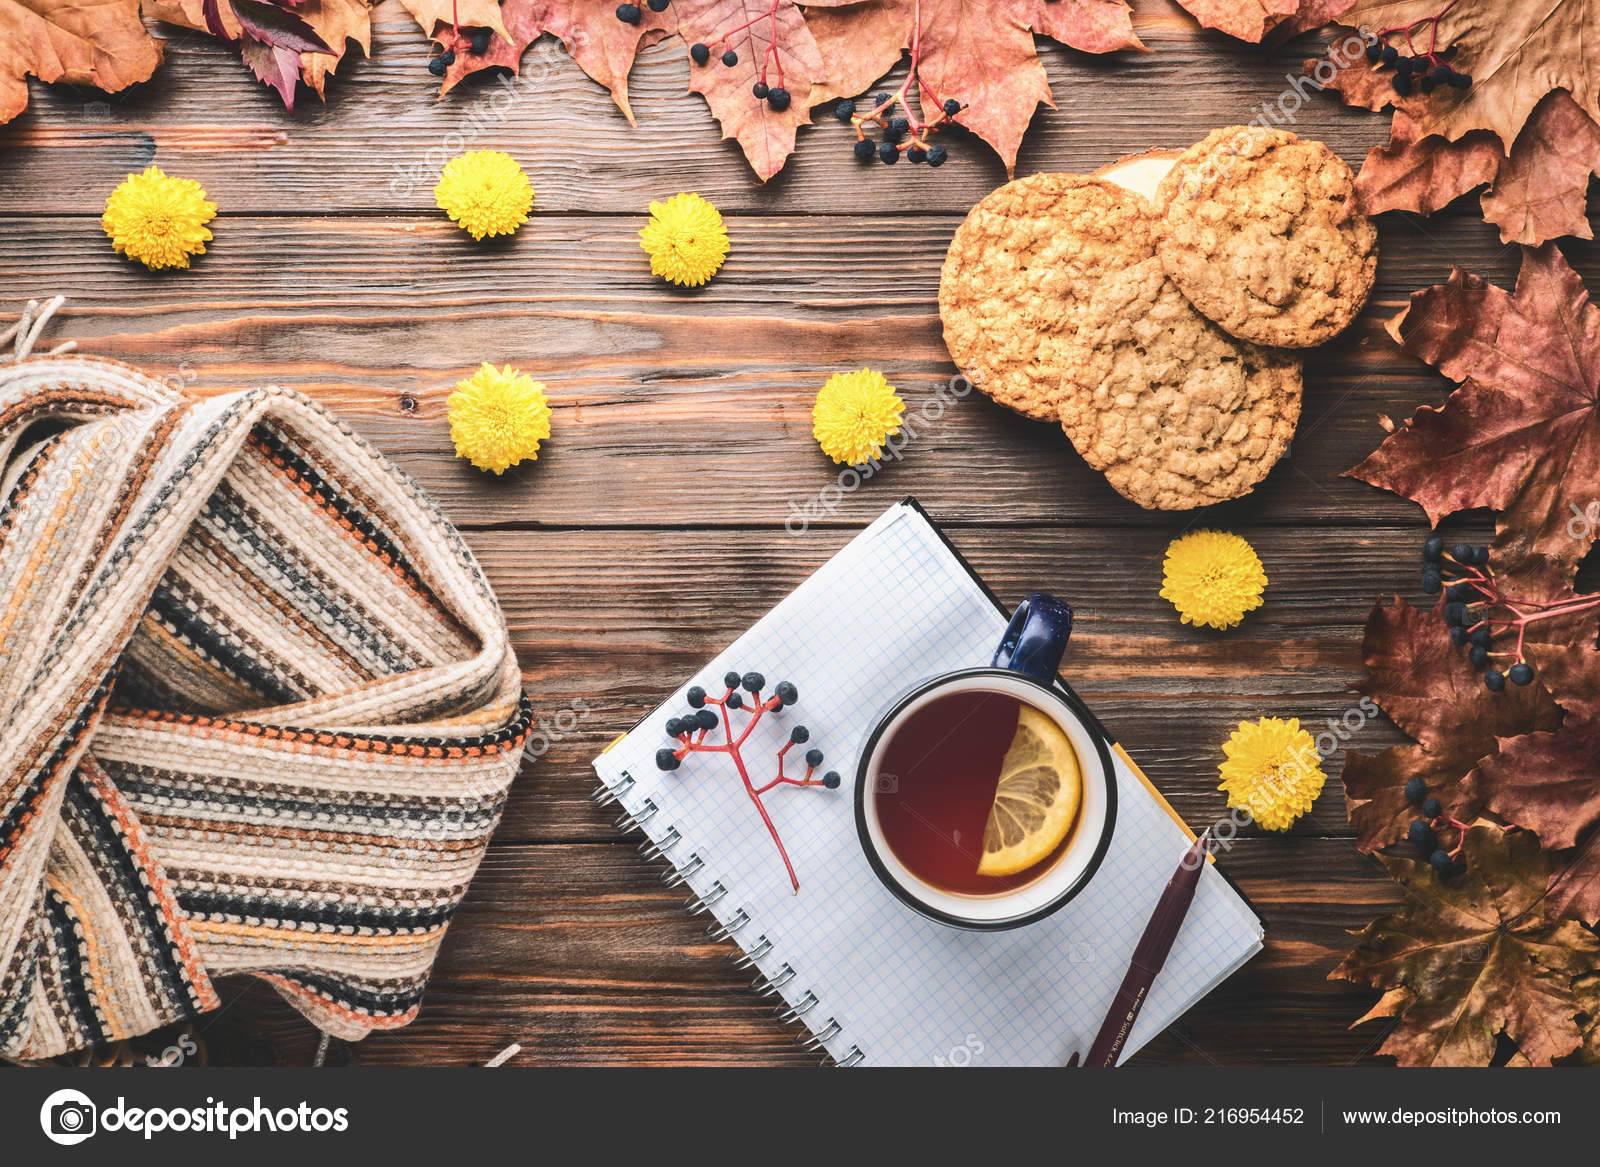 Autumn Fashion Seasonal Concept Scandinavian Knitted Scarf Cup Hot Black Stock Photo C Iskrinka74 216954452